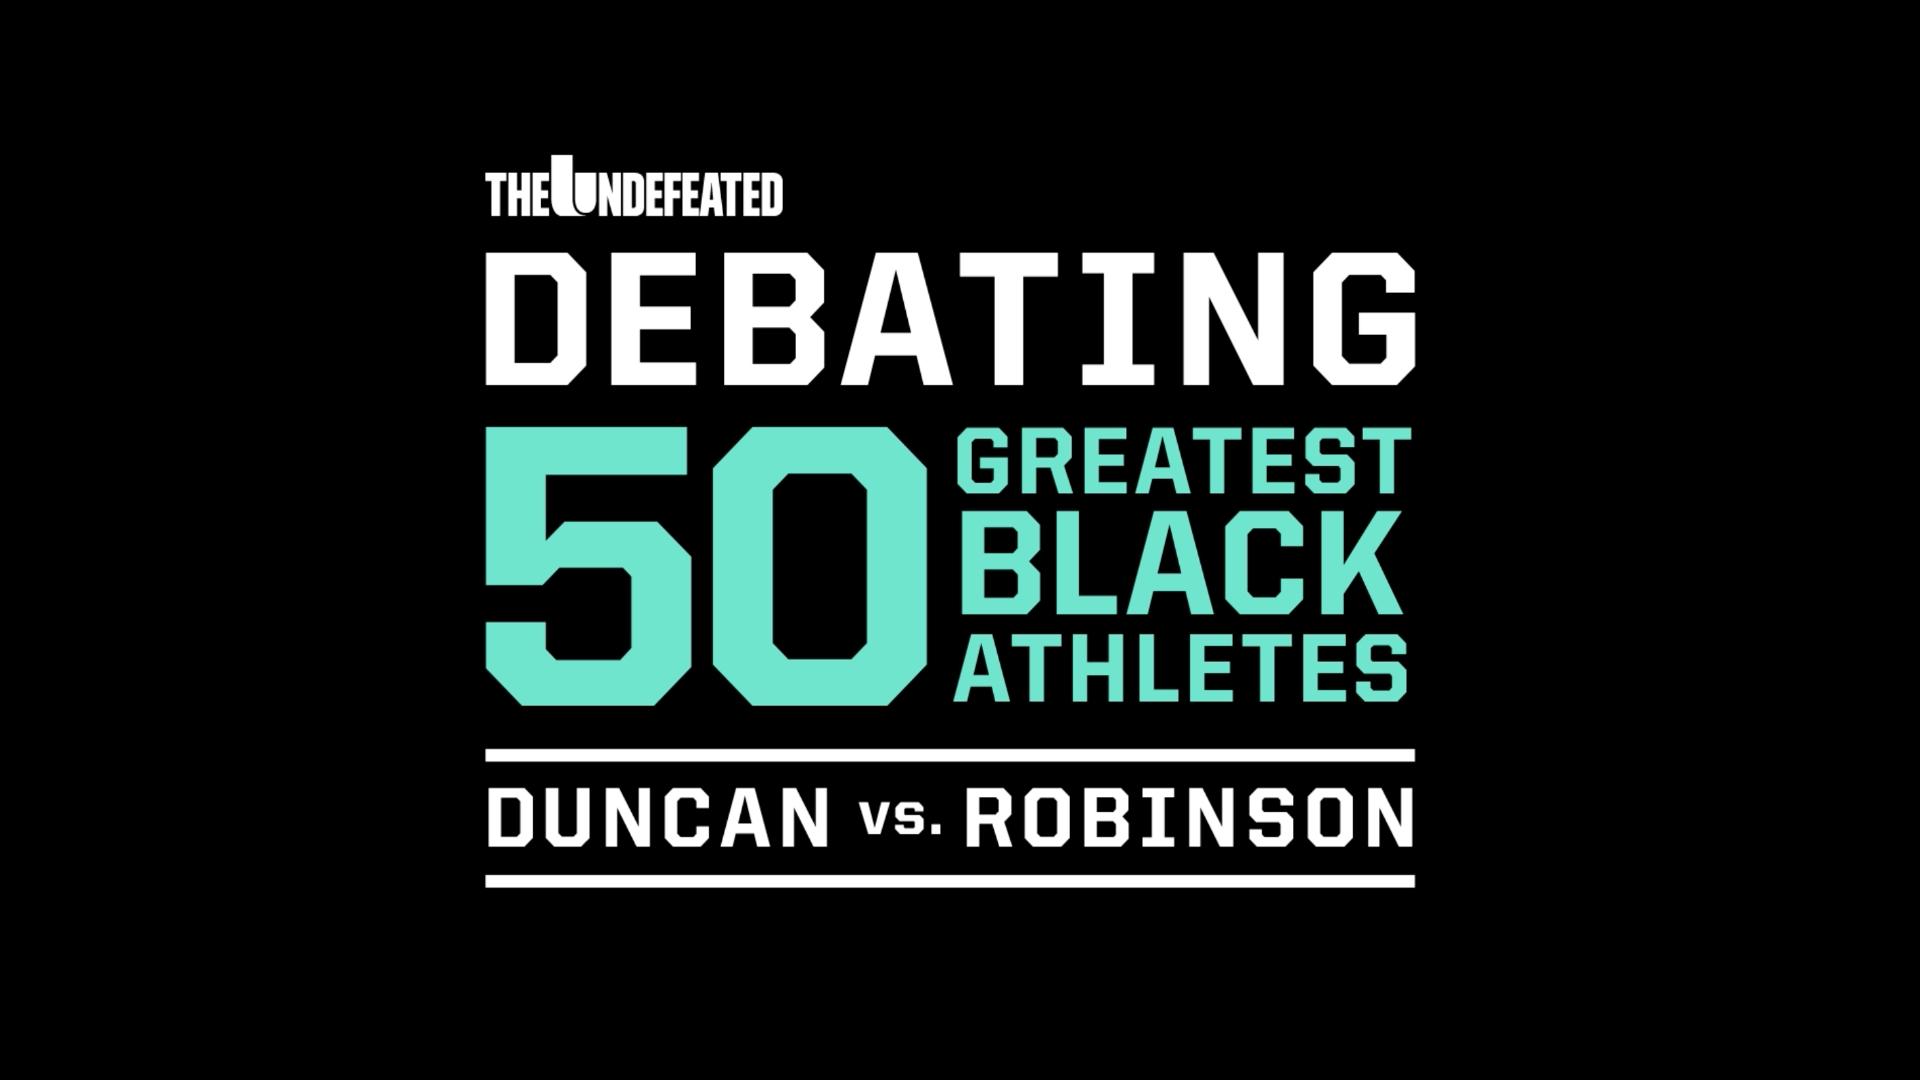 62ff1c76a4 50 Greatest Black Athletes debate: Tim Duncan vs. David Robinson